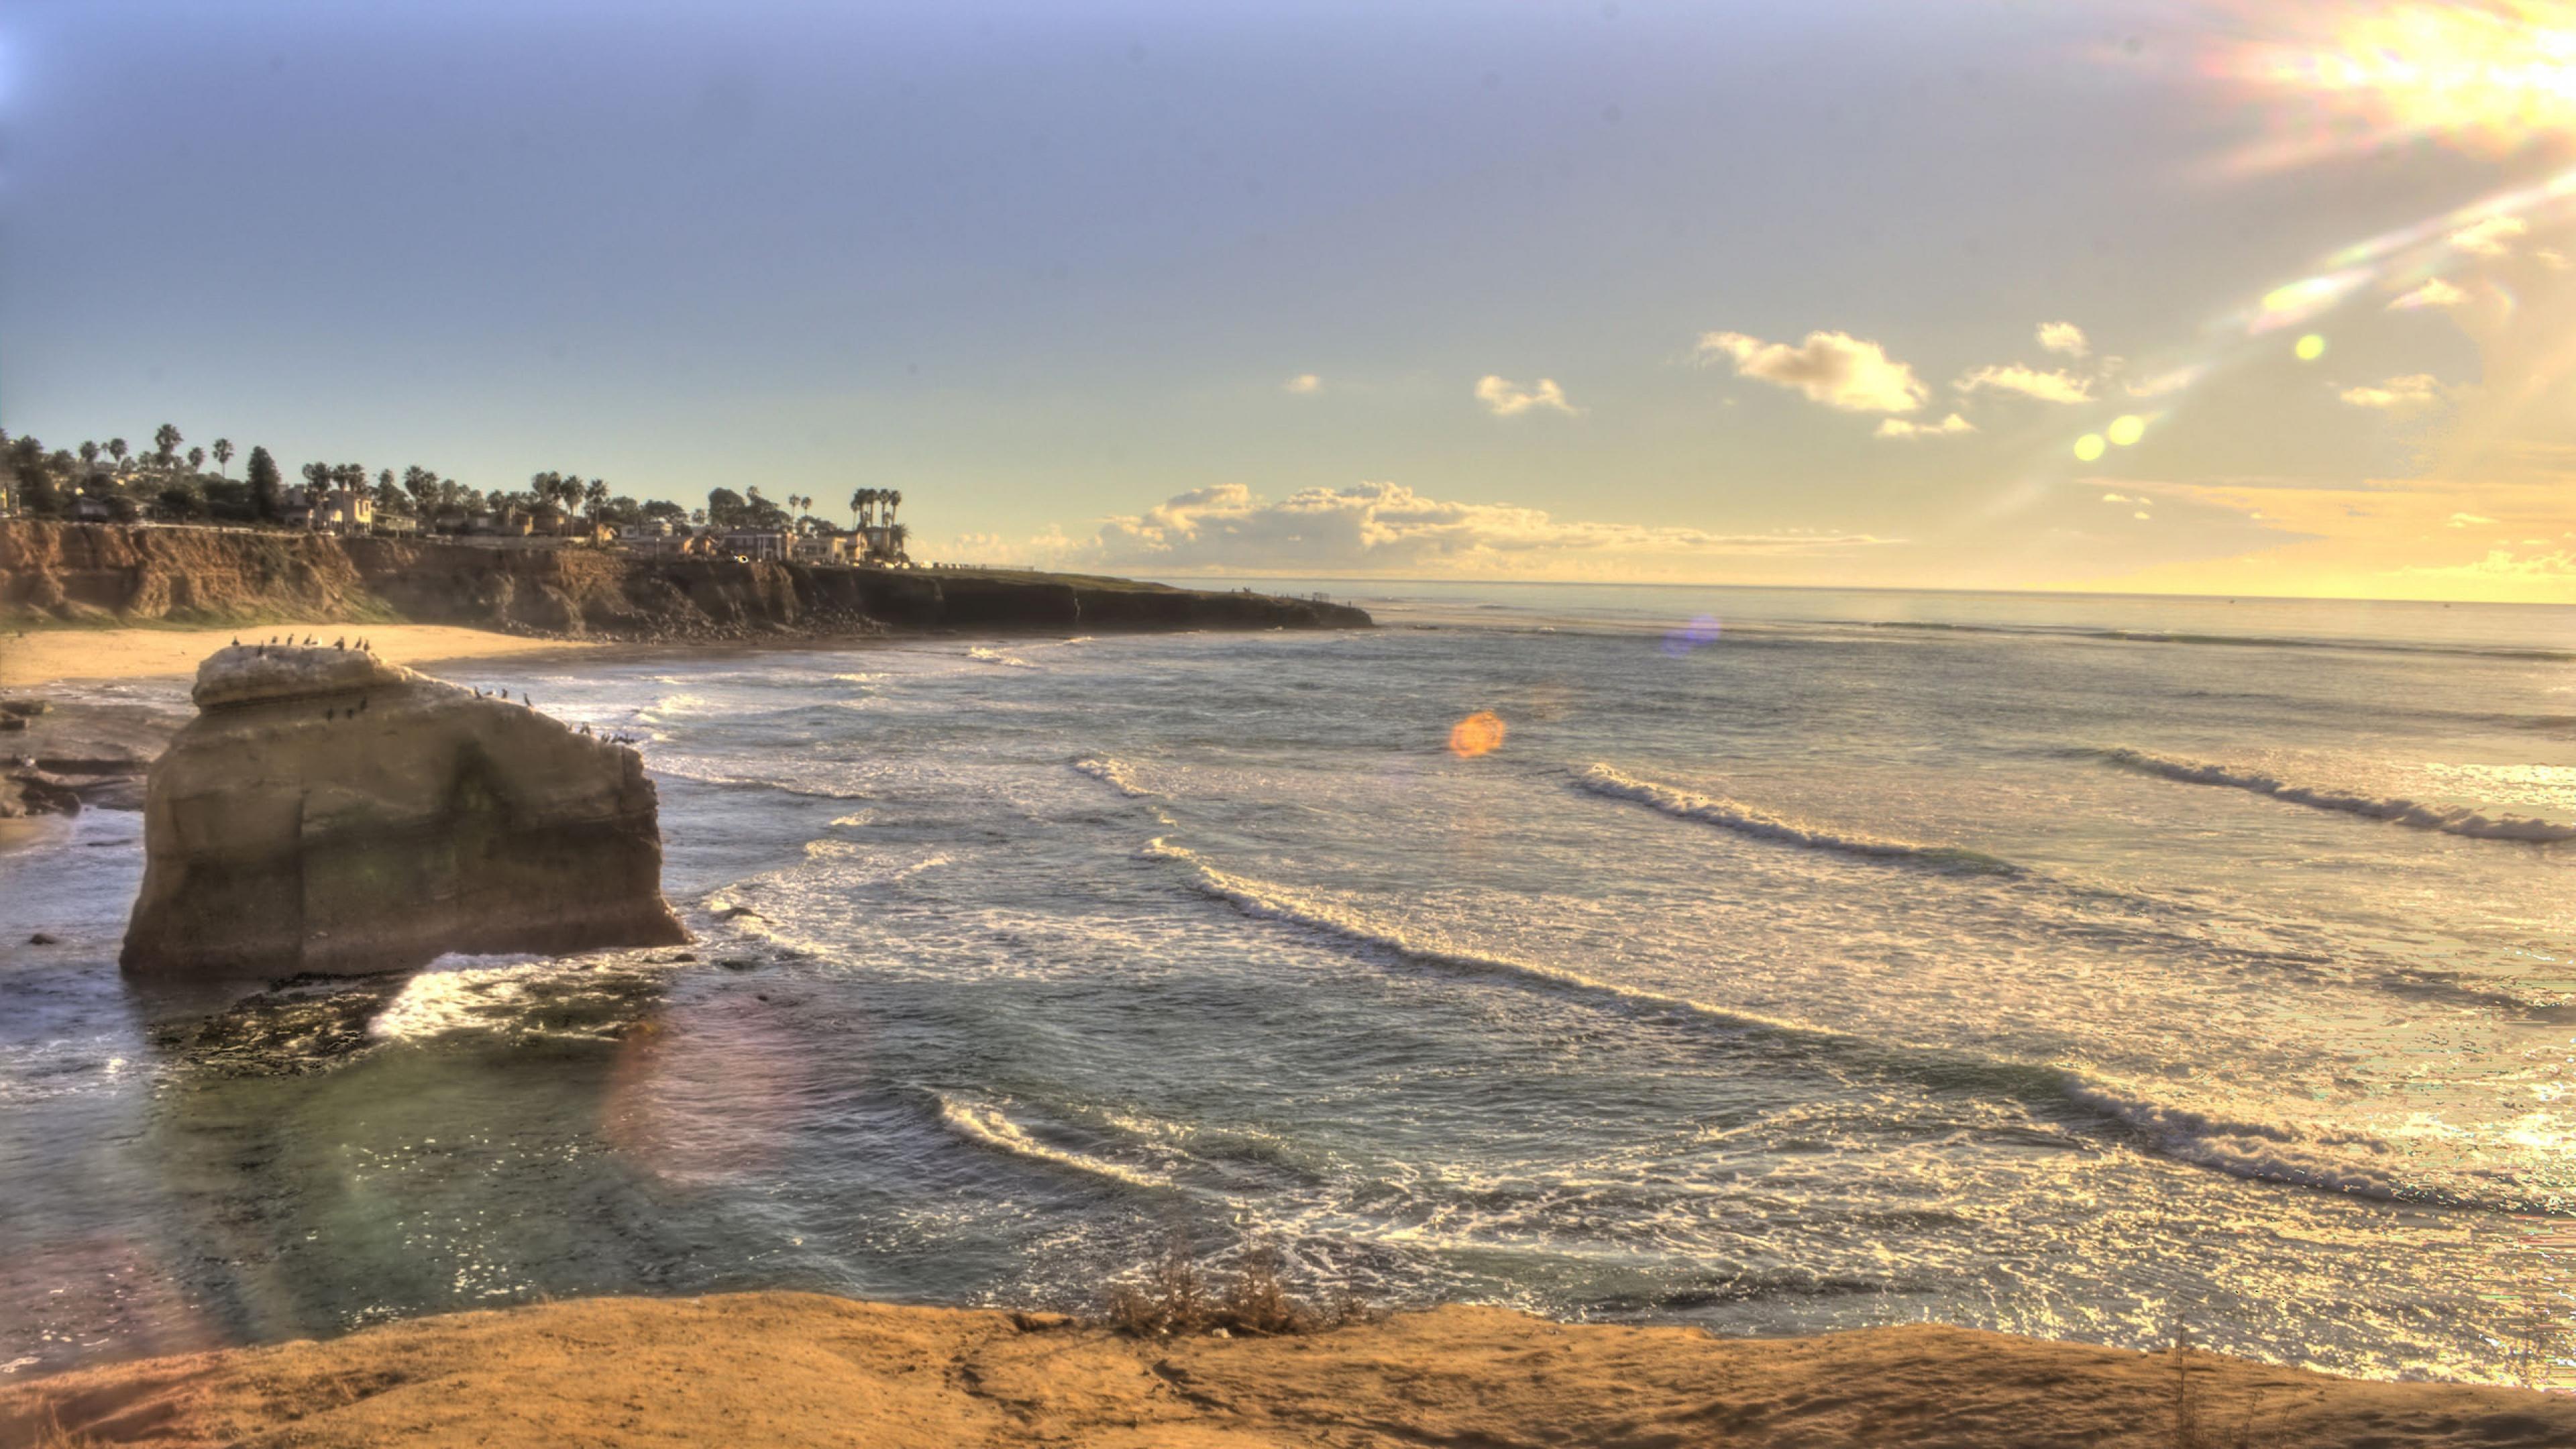 Beach San diego California Usa Wallpaper Background 4K Ultra HD 3840x2160